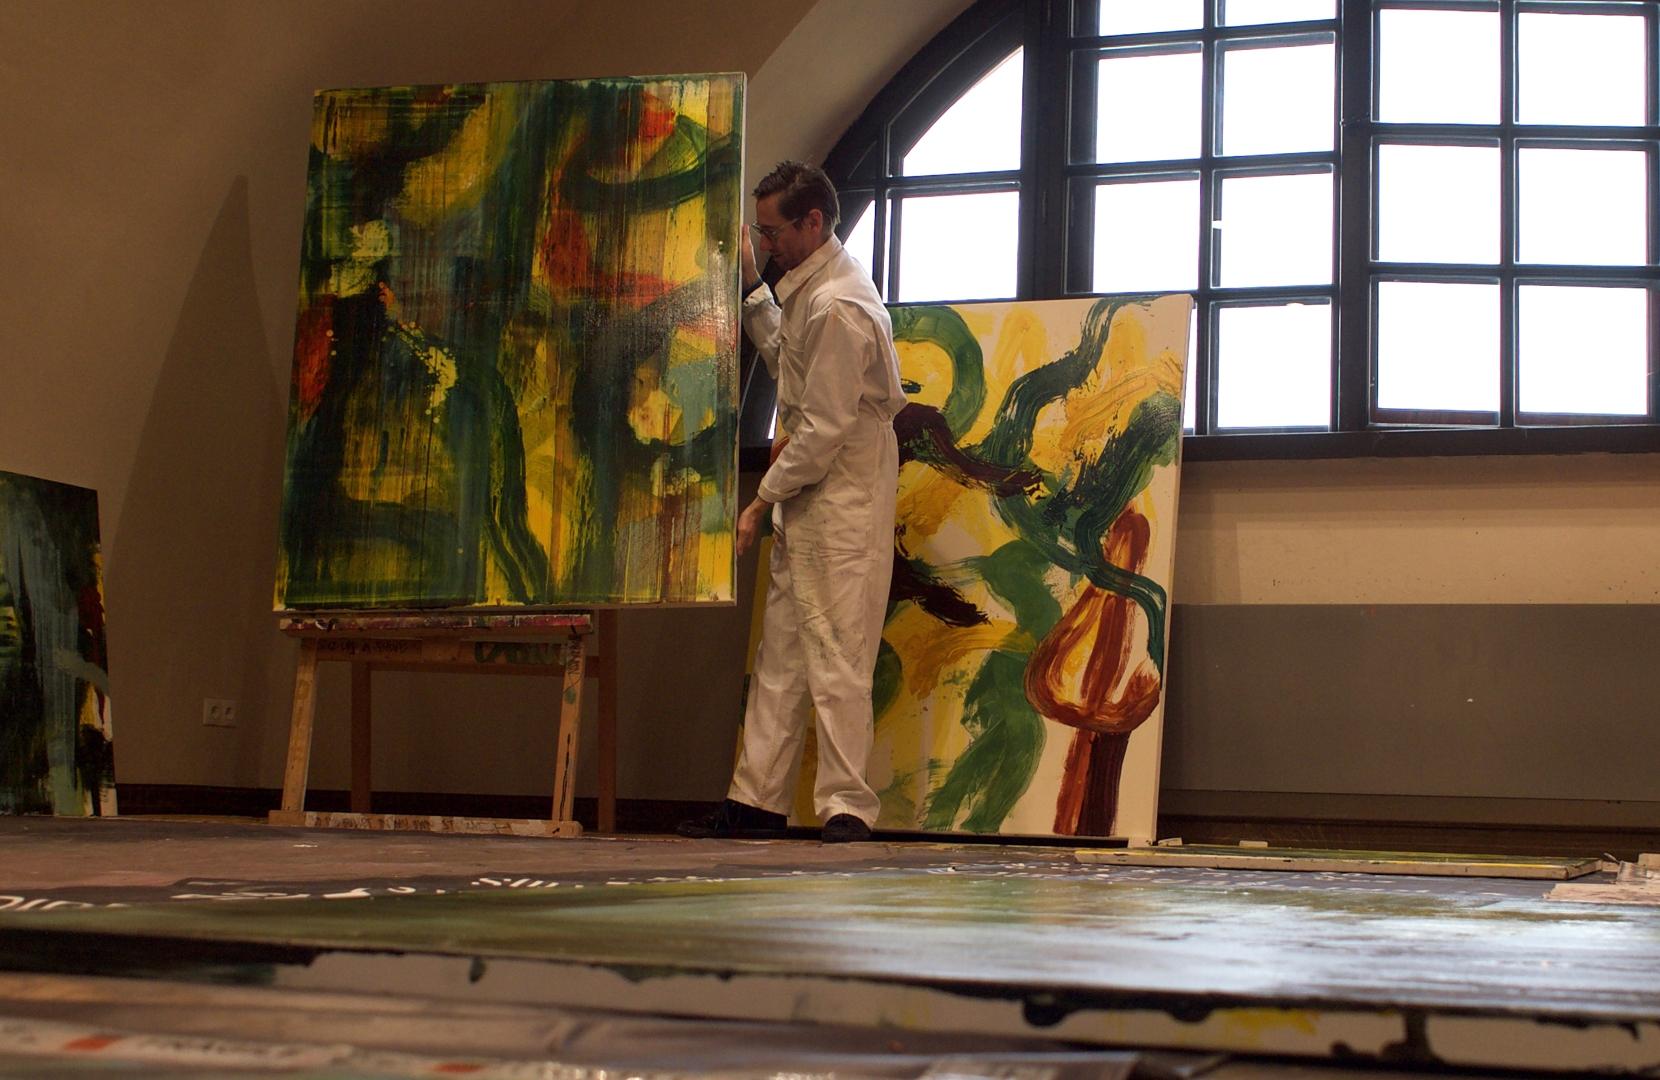 Anthony White at The Mark Rothko Centre, Latvia image